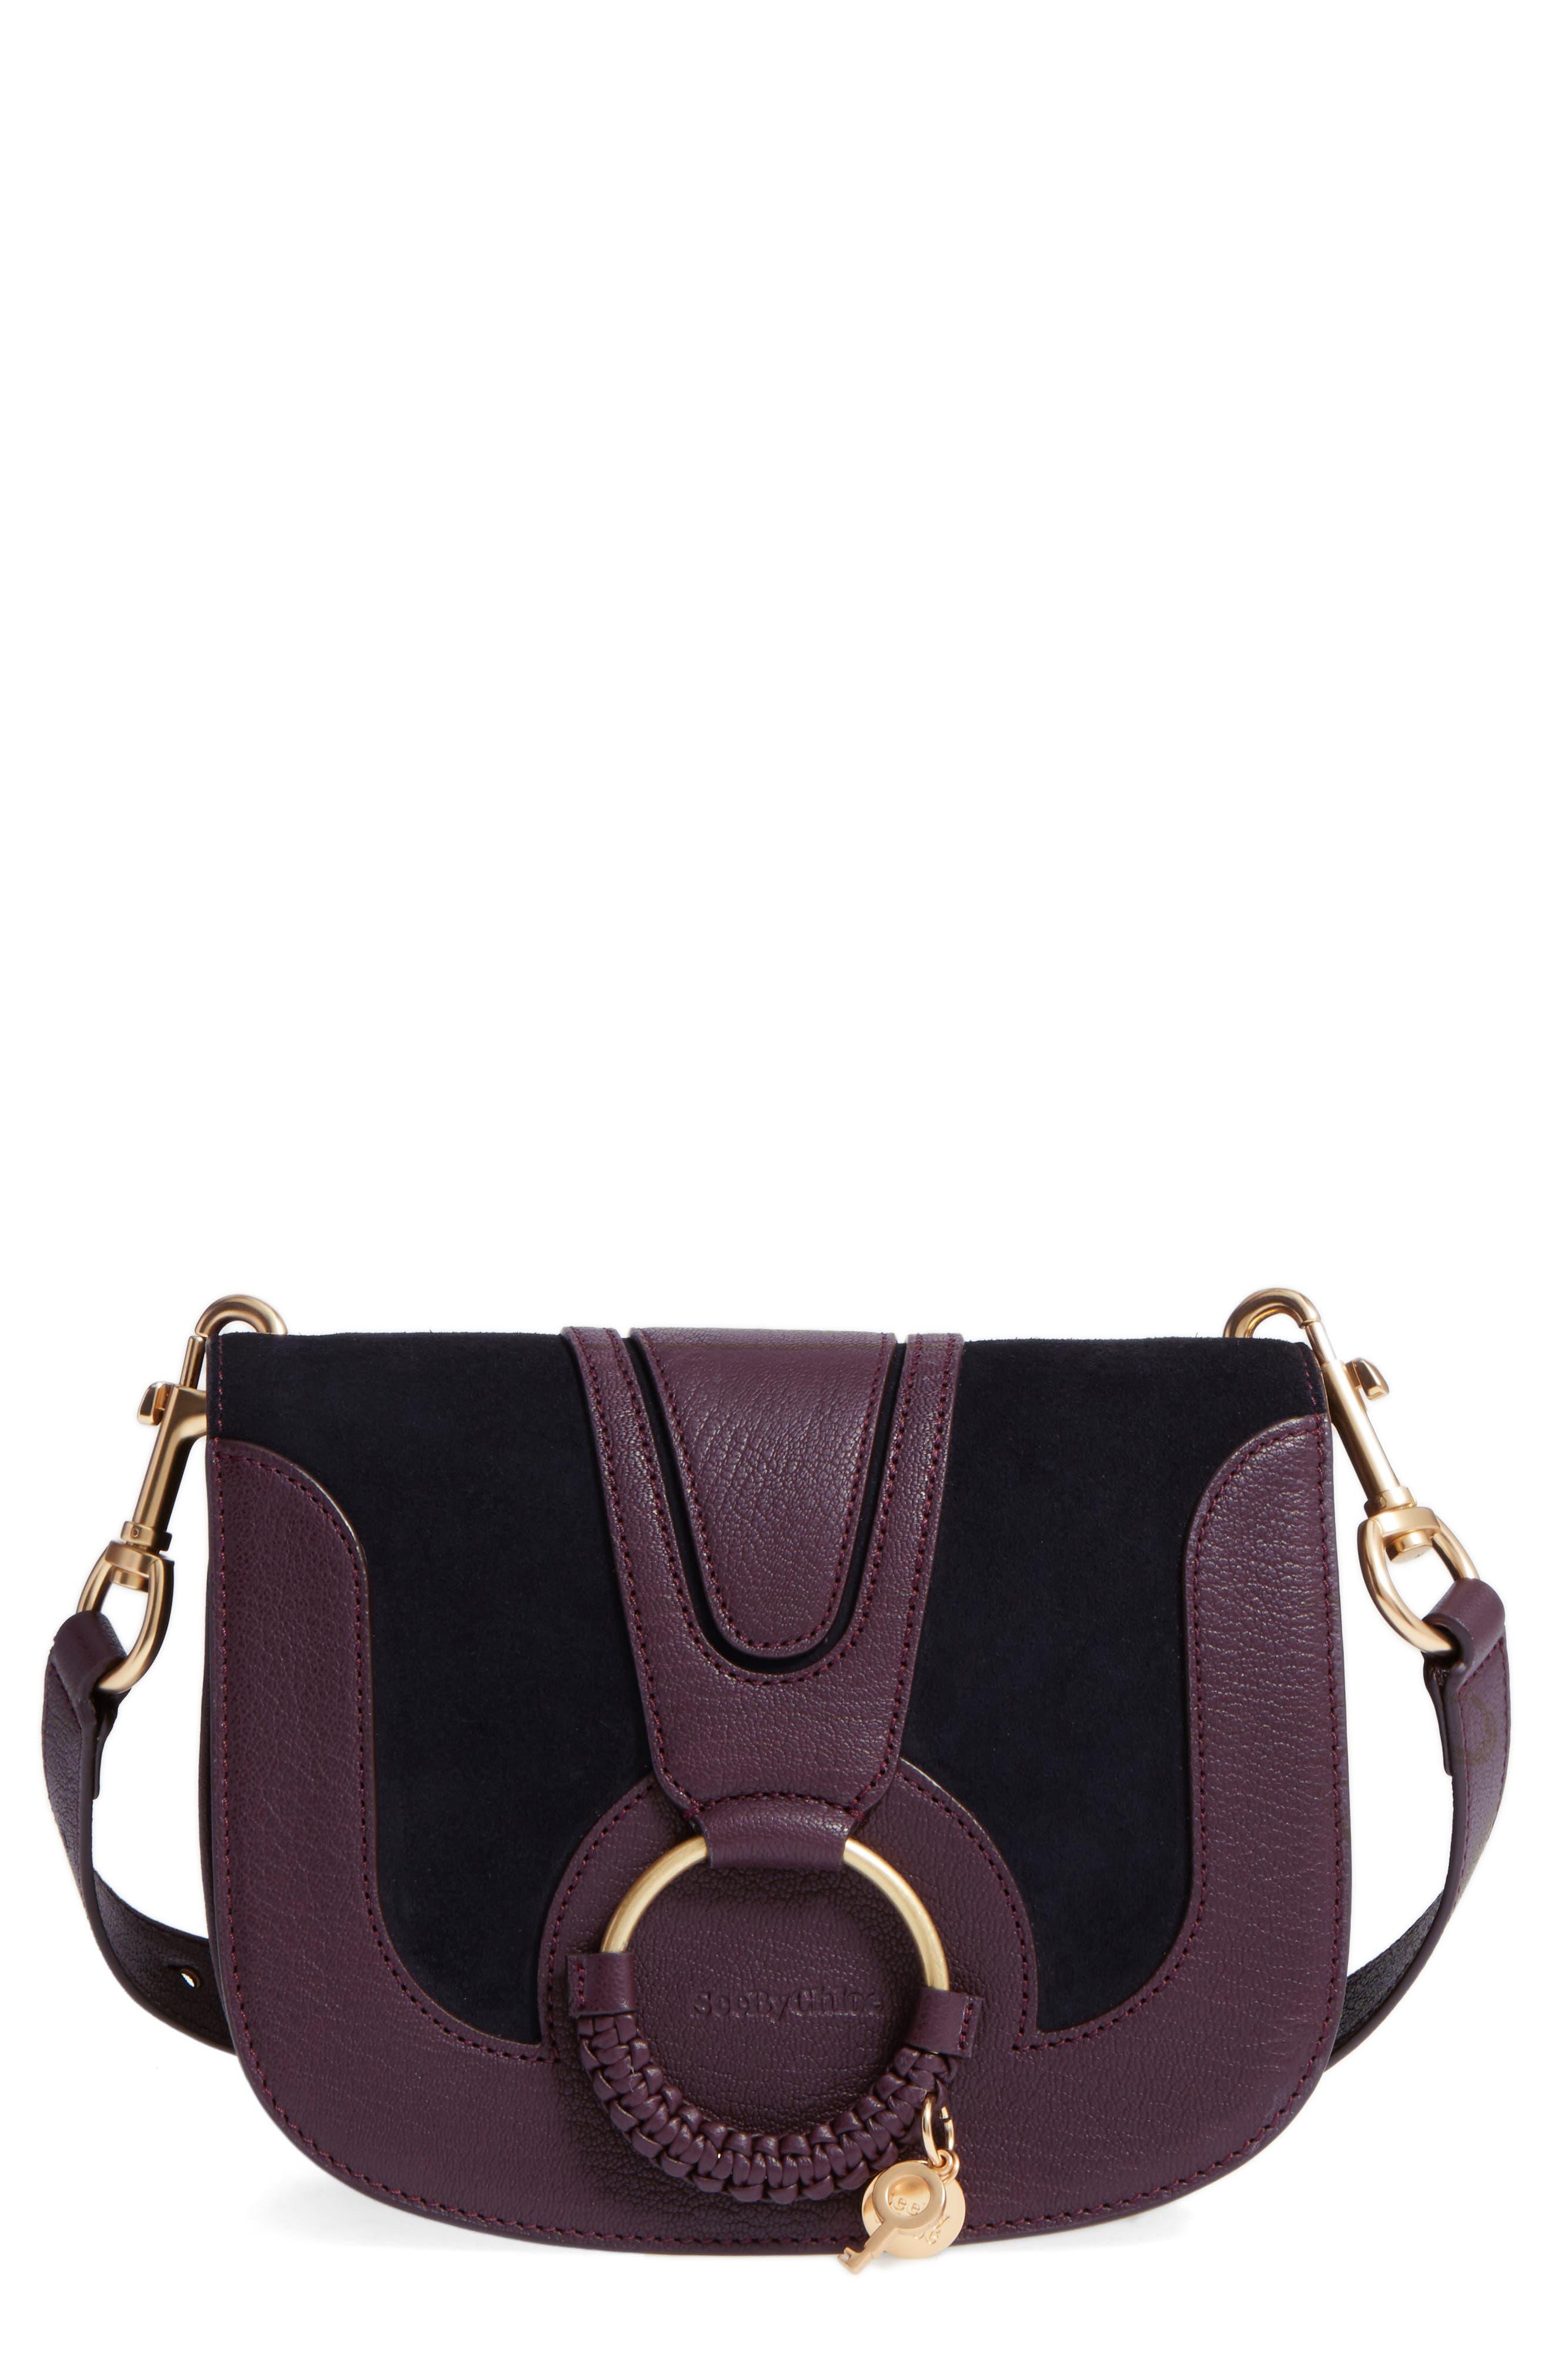 Hana Small Leather Crossbody Bag,                             Main thumbnail 6, color,